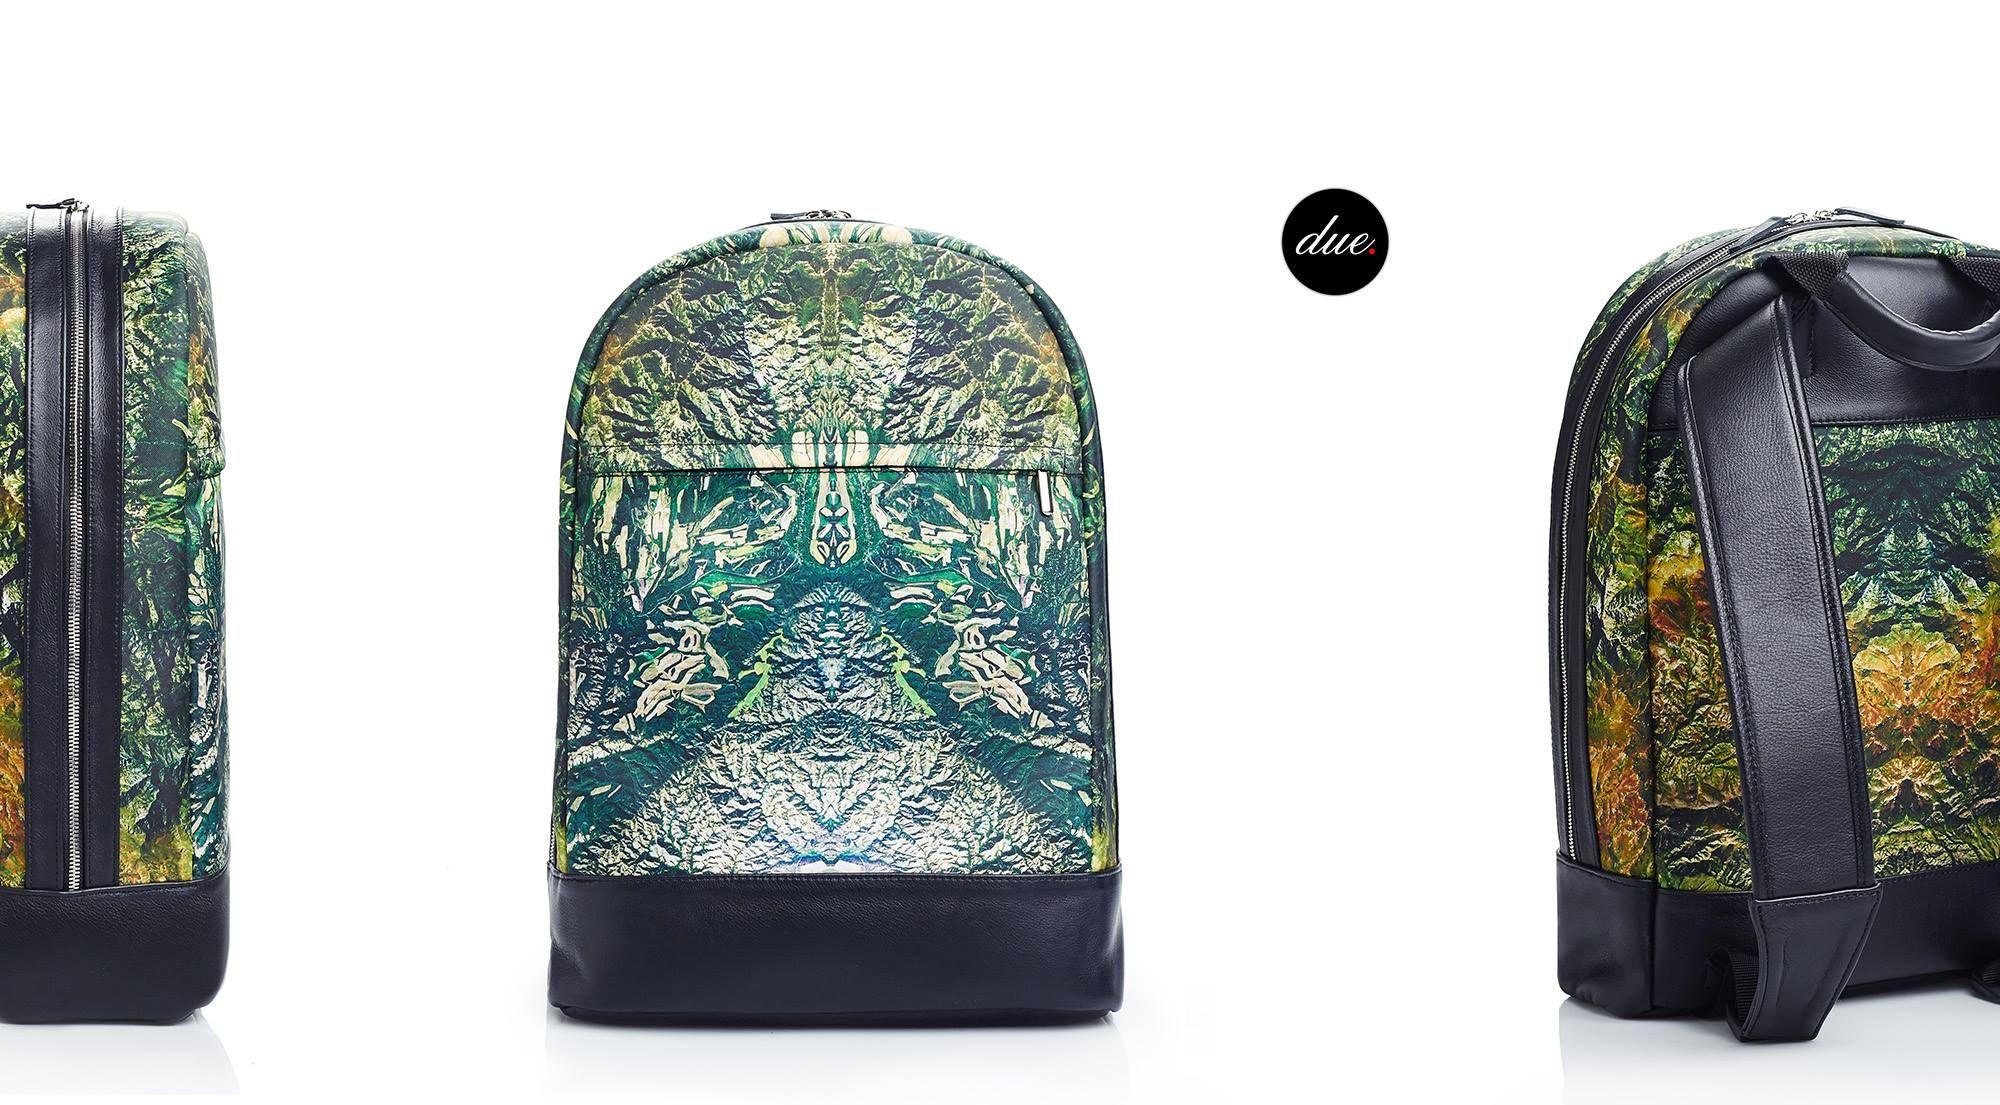 #duofashion #duo #rucksack #naturepatterns